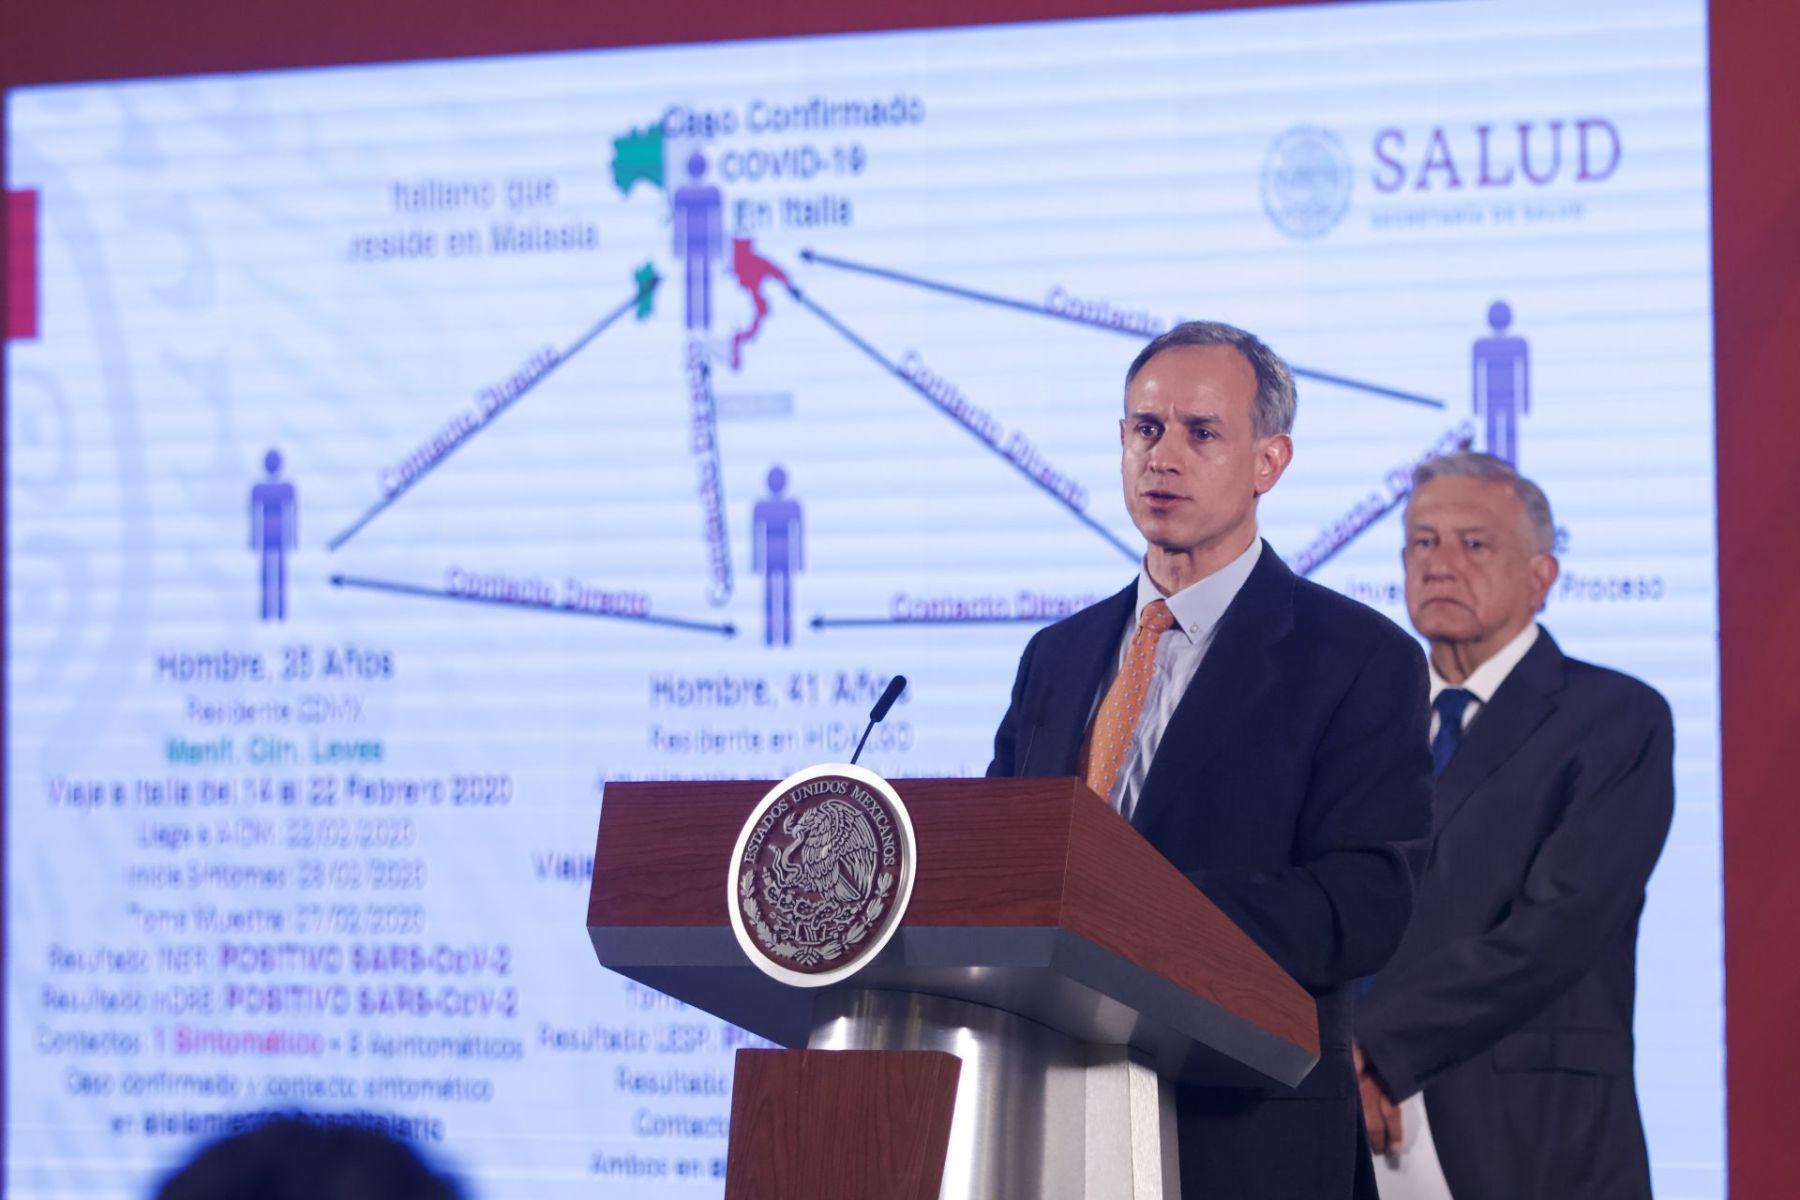 México confirma sus primeros 2 casos de coronavirus